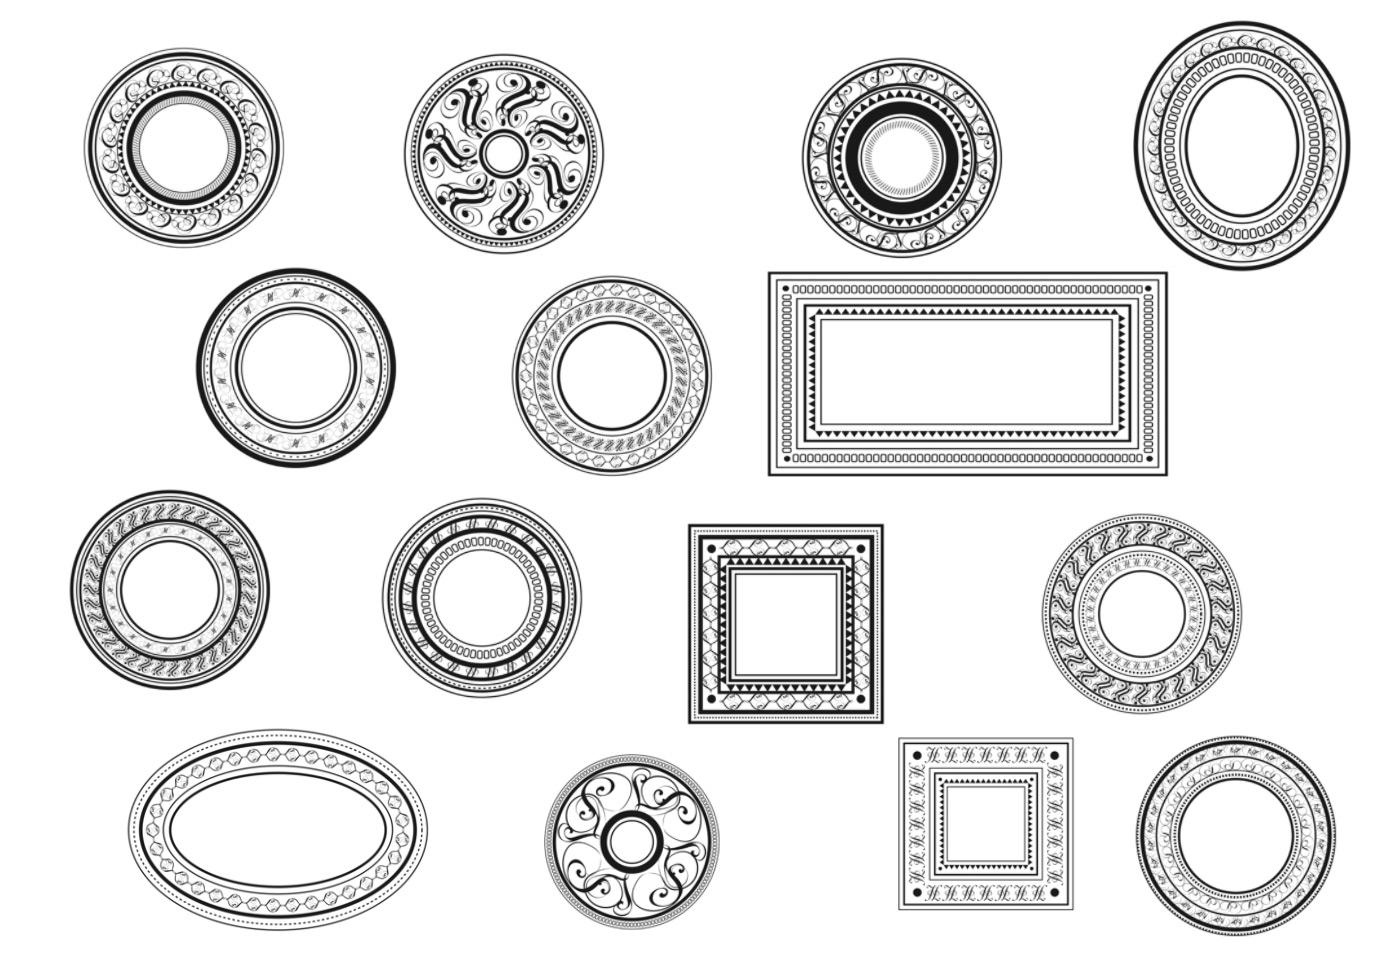 Dekorative Vintage Rahmen Pinsel Pack - Kostenlose Photoshop-Pinsel ...